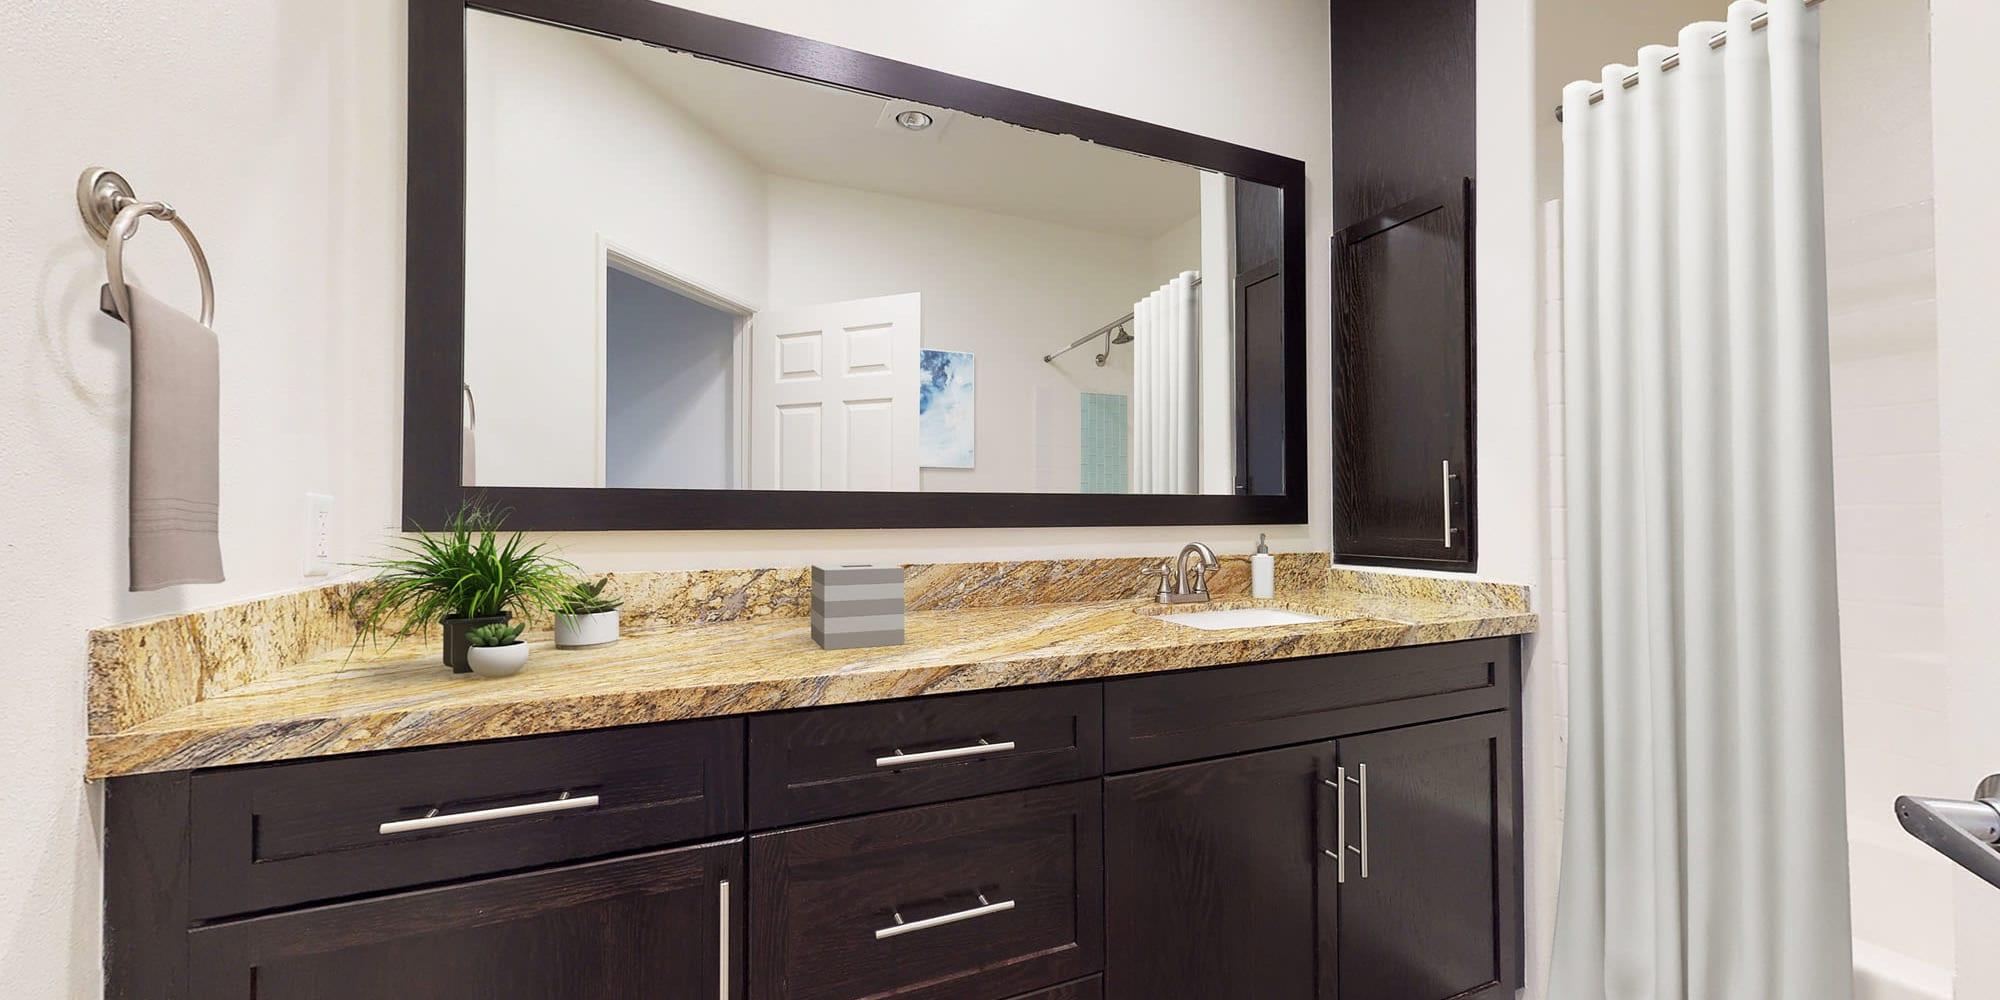 Granite countertop and an overside vanity mirror in a model apartment's bathroom at L'Estancia in Studio City, California